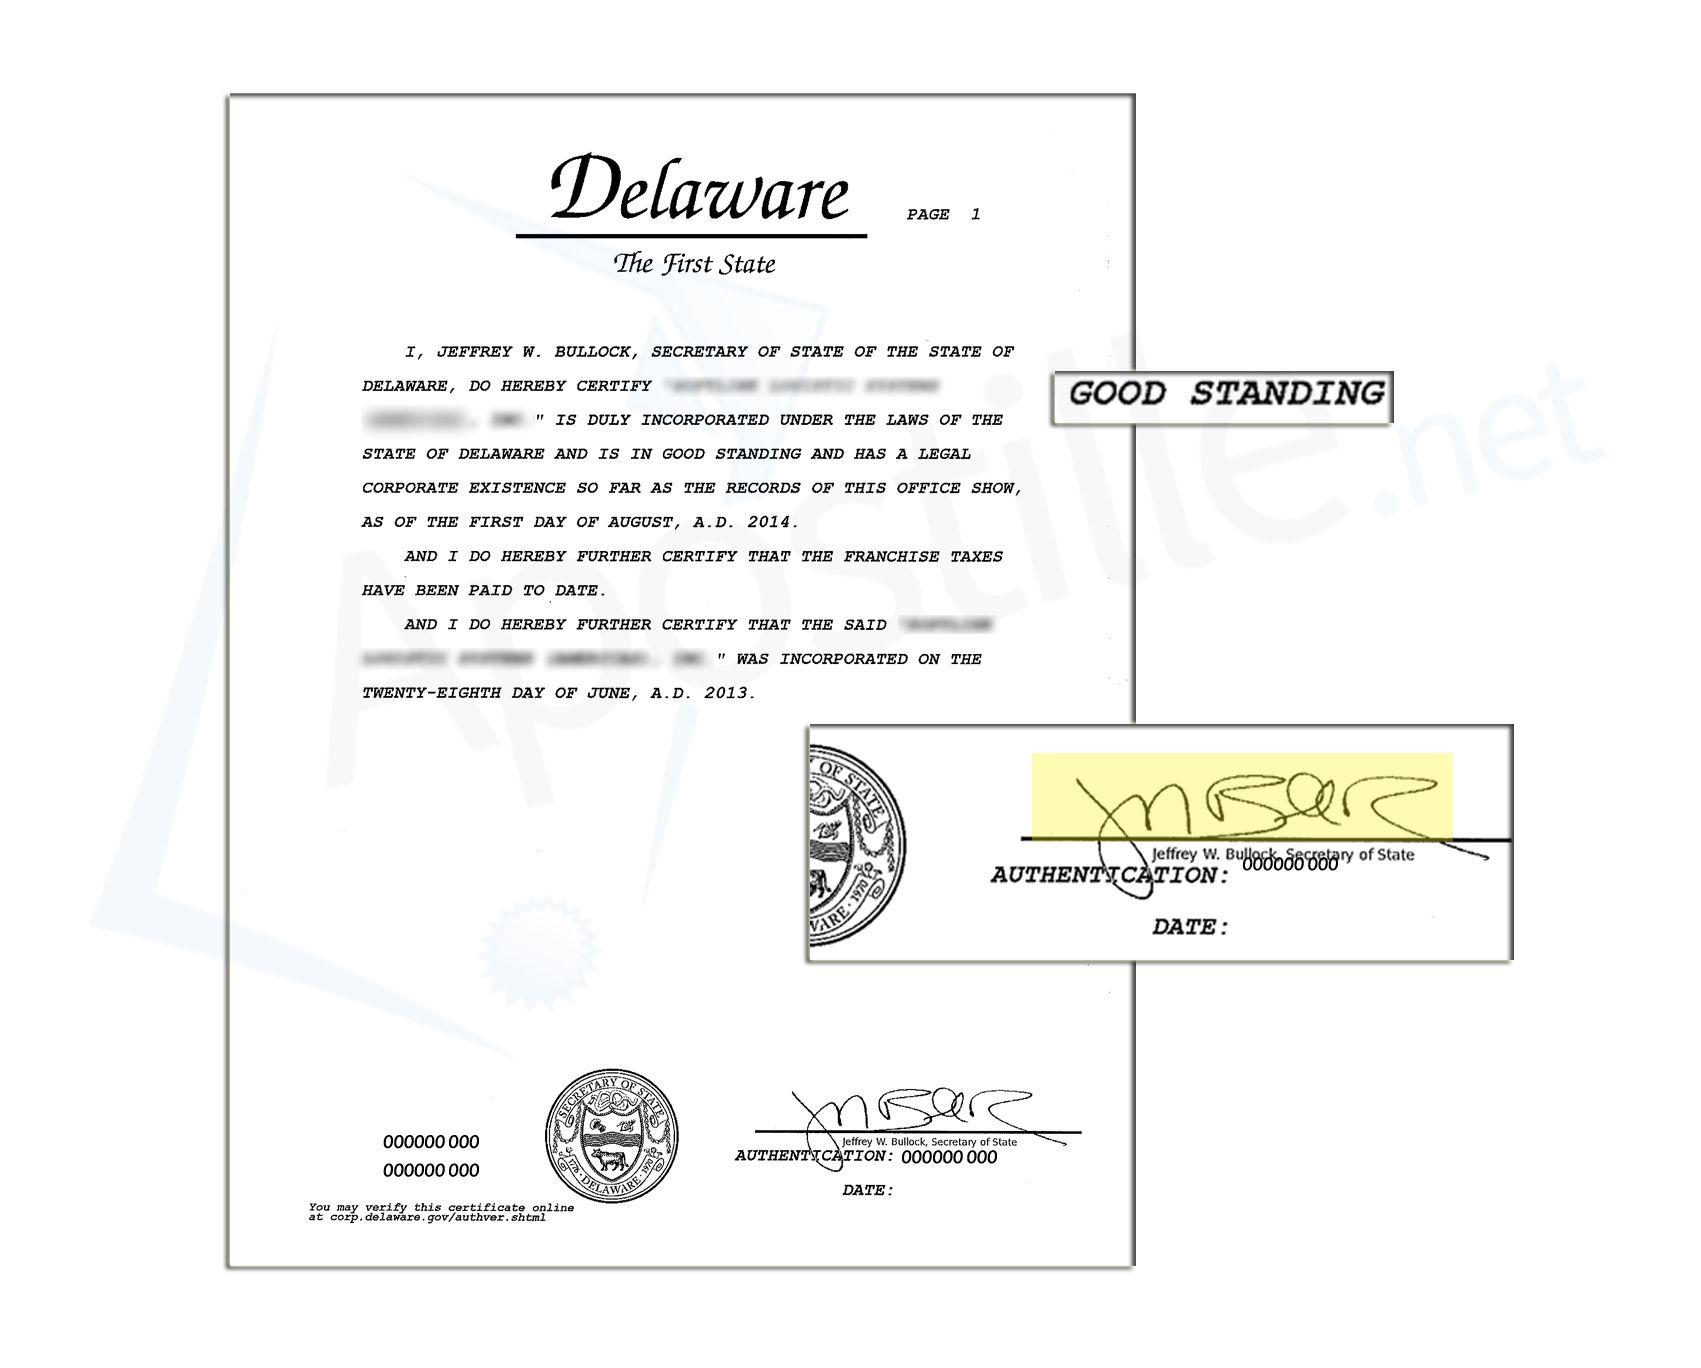 Delaware Certificate Of Good Standing State Of Delaware Sample